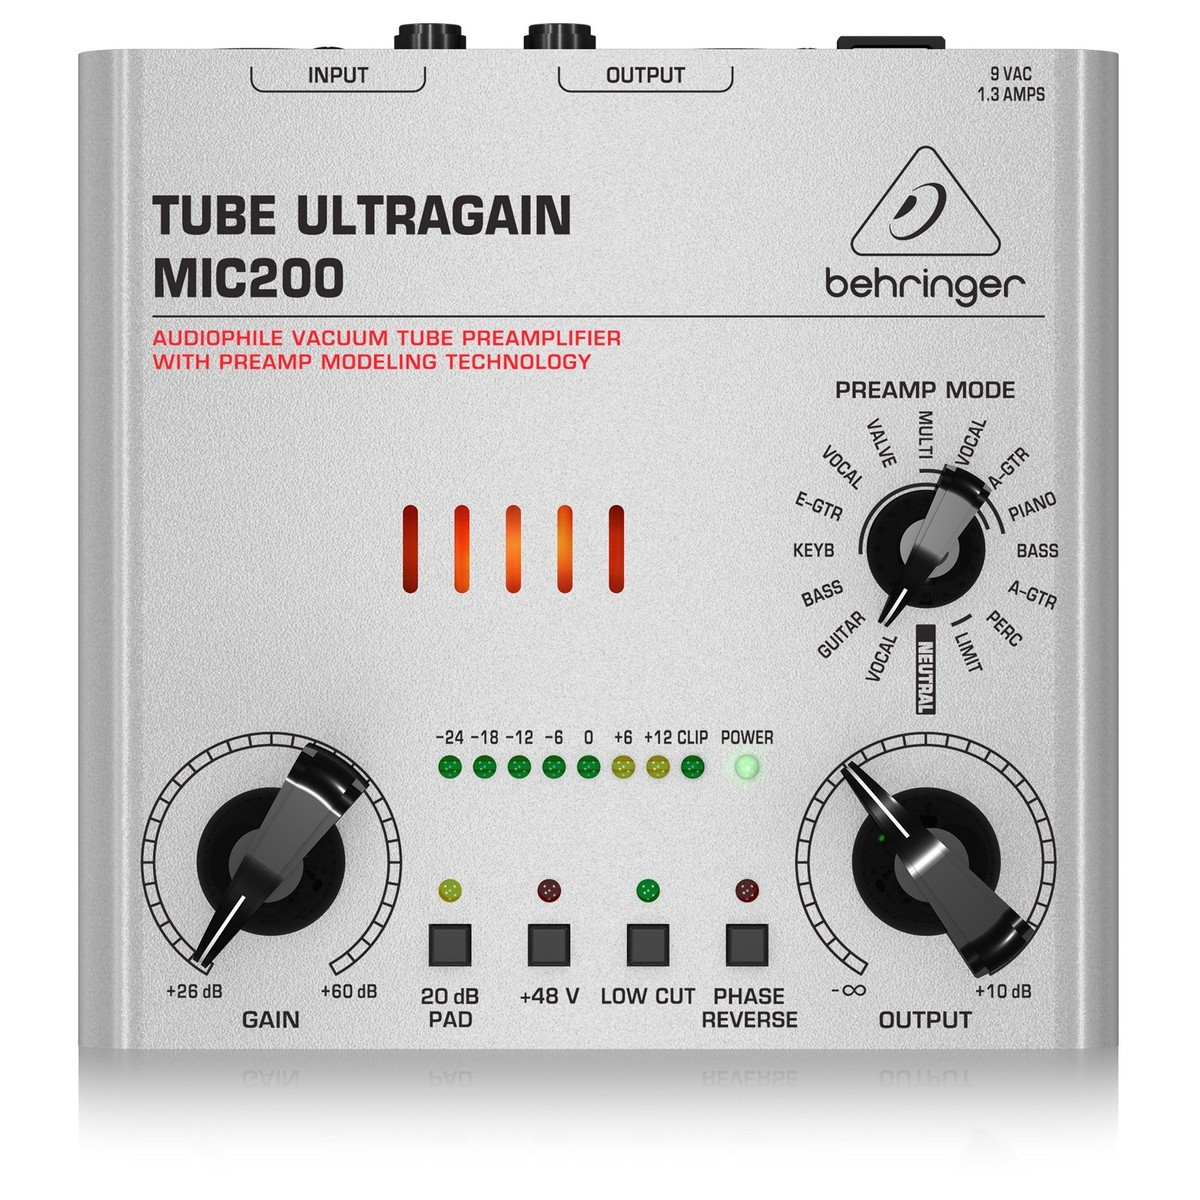 Behringer MIC200 Tube Ultragain Mikrofon Preamp | Gear4music